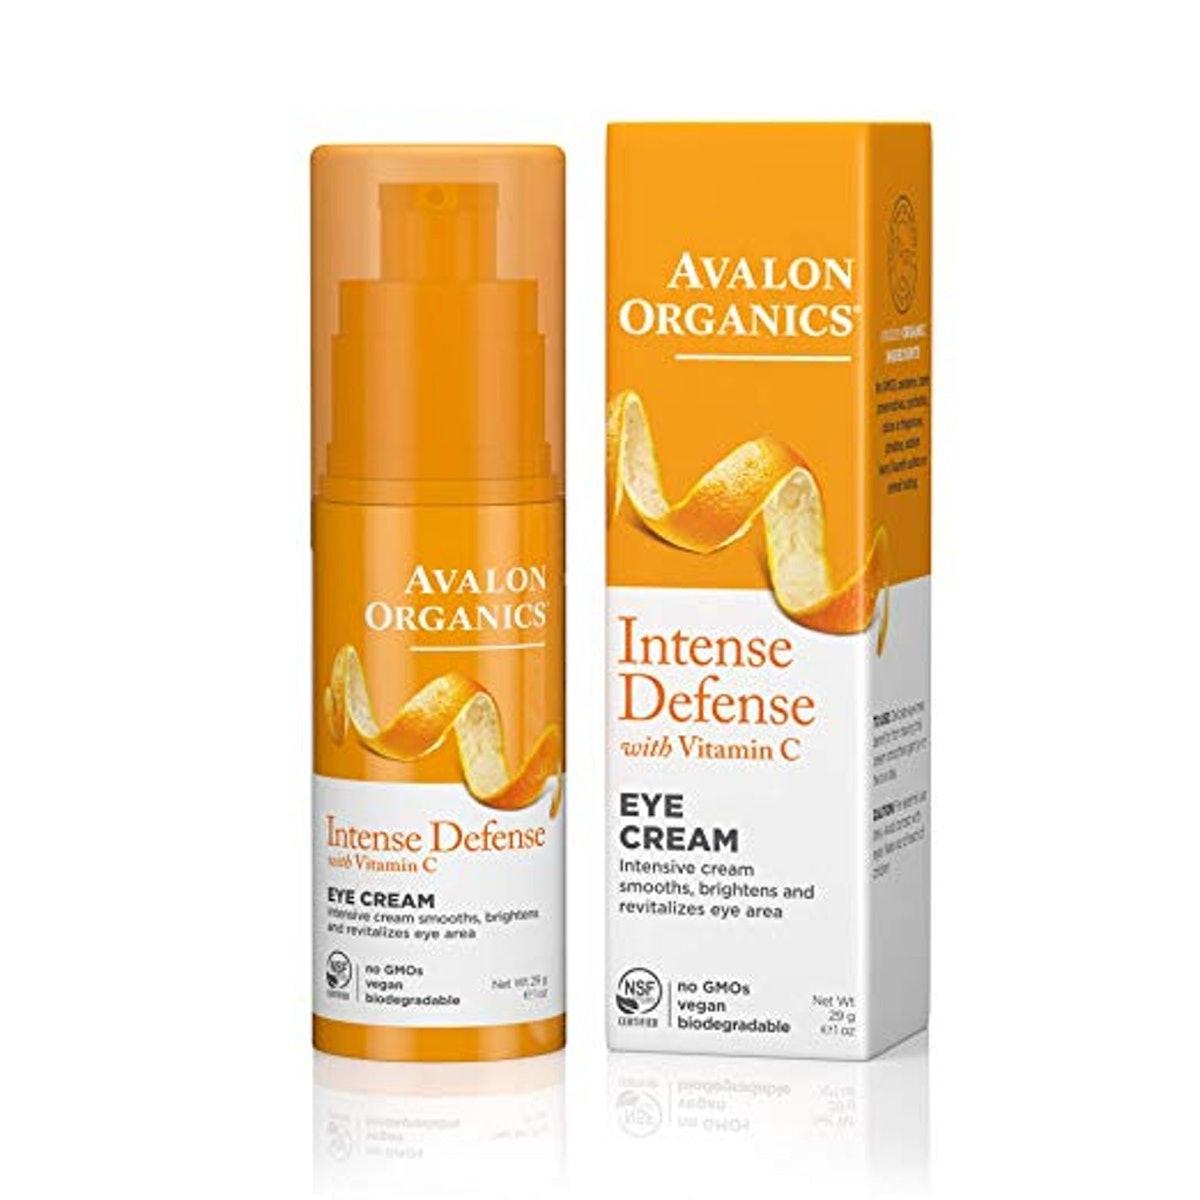 Avalon Organics Intense Defense Eye Cream